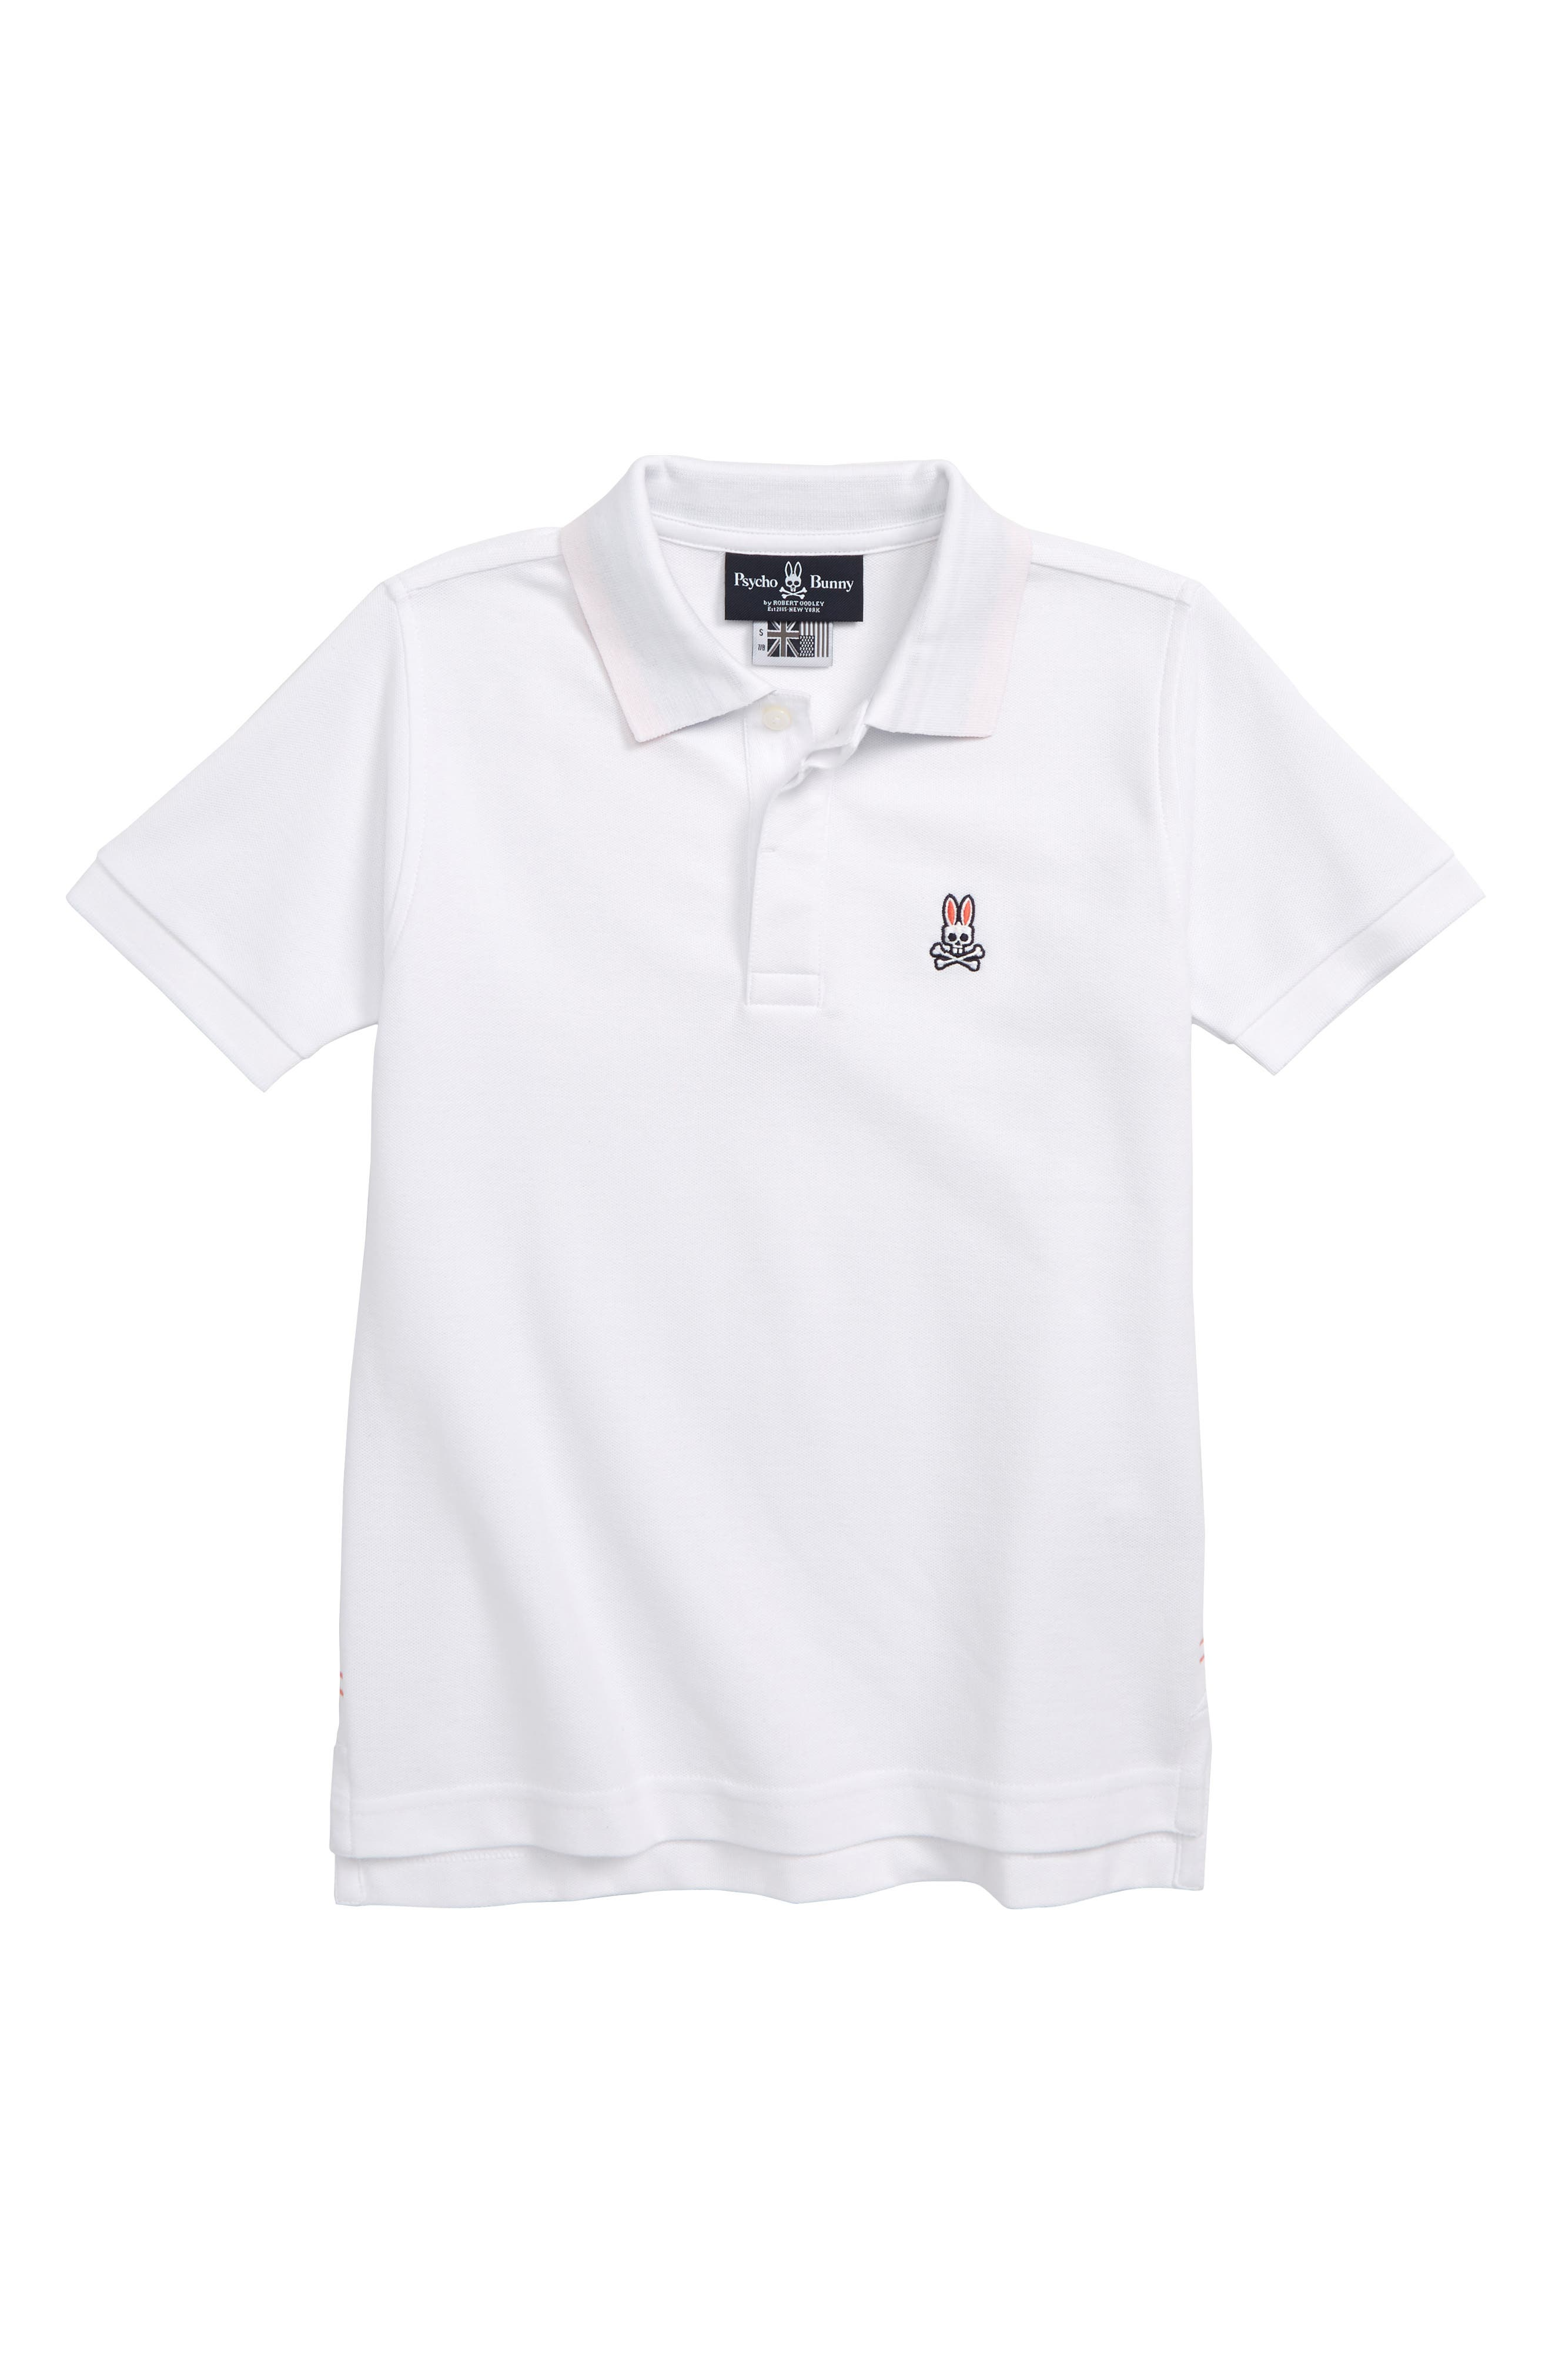 Porthill Polo Shirt,                             Main thumbnail 1, color,                             WHITE